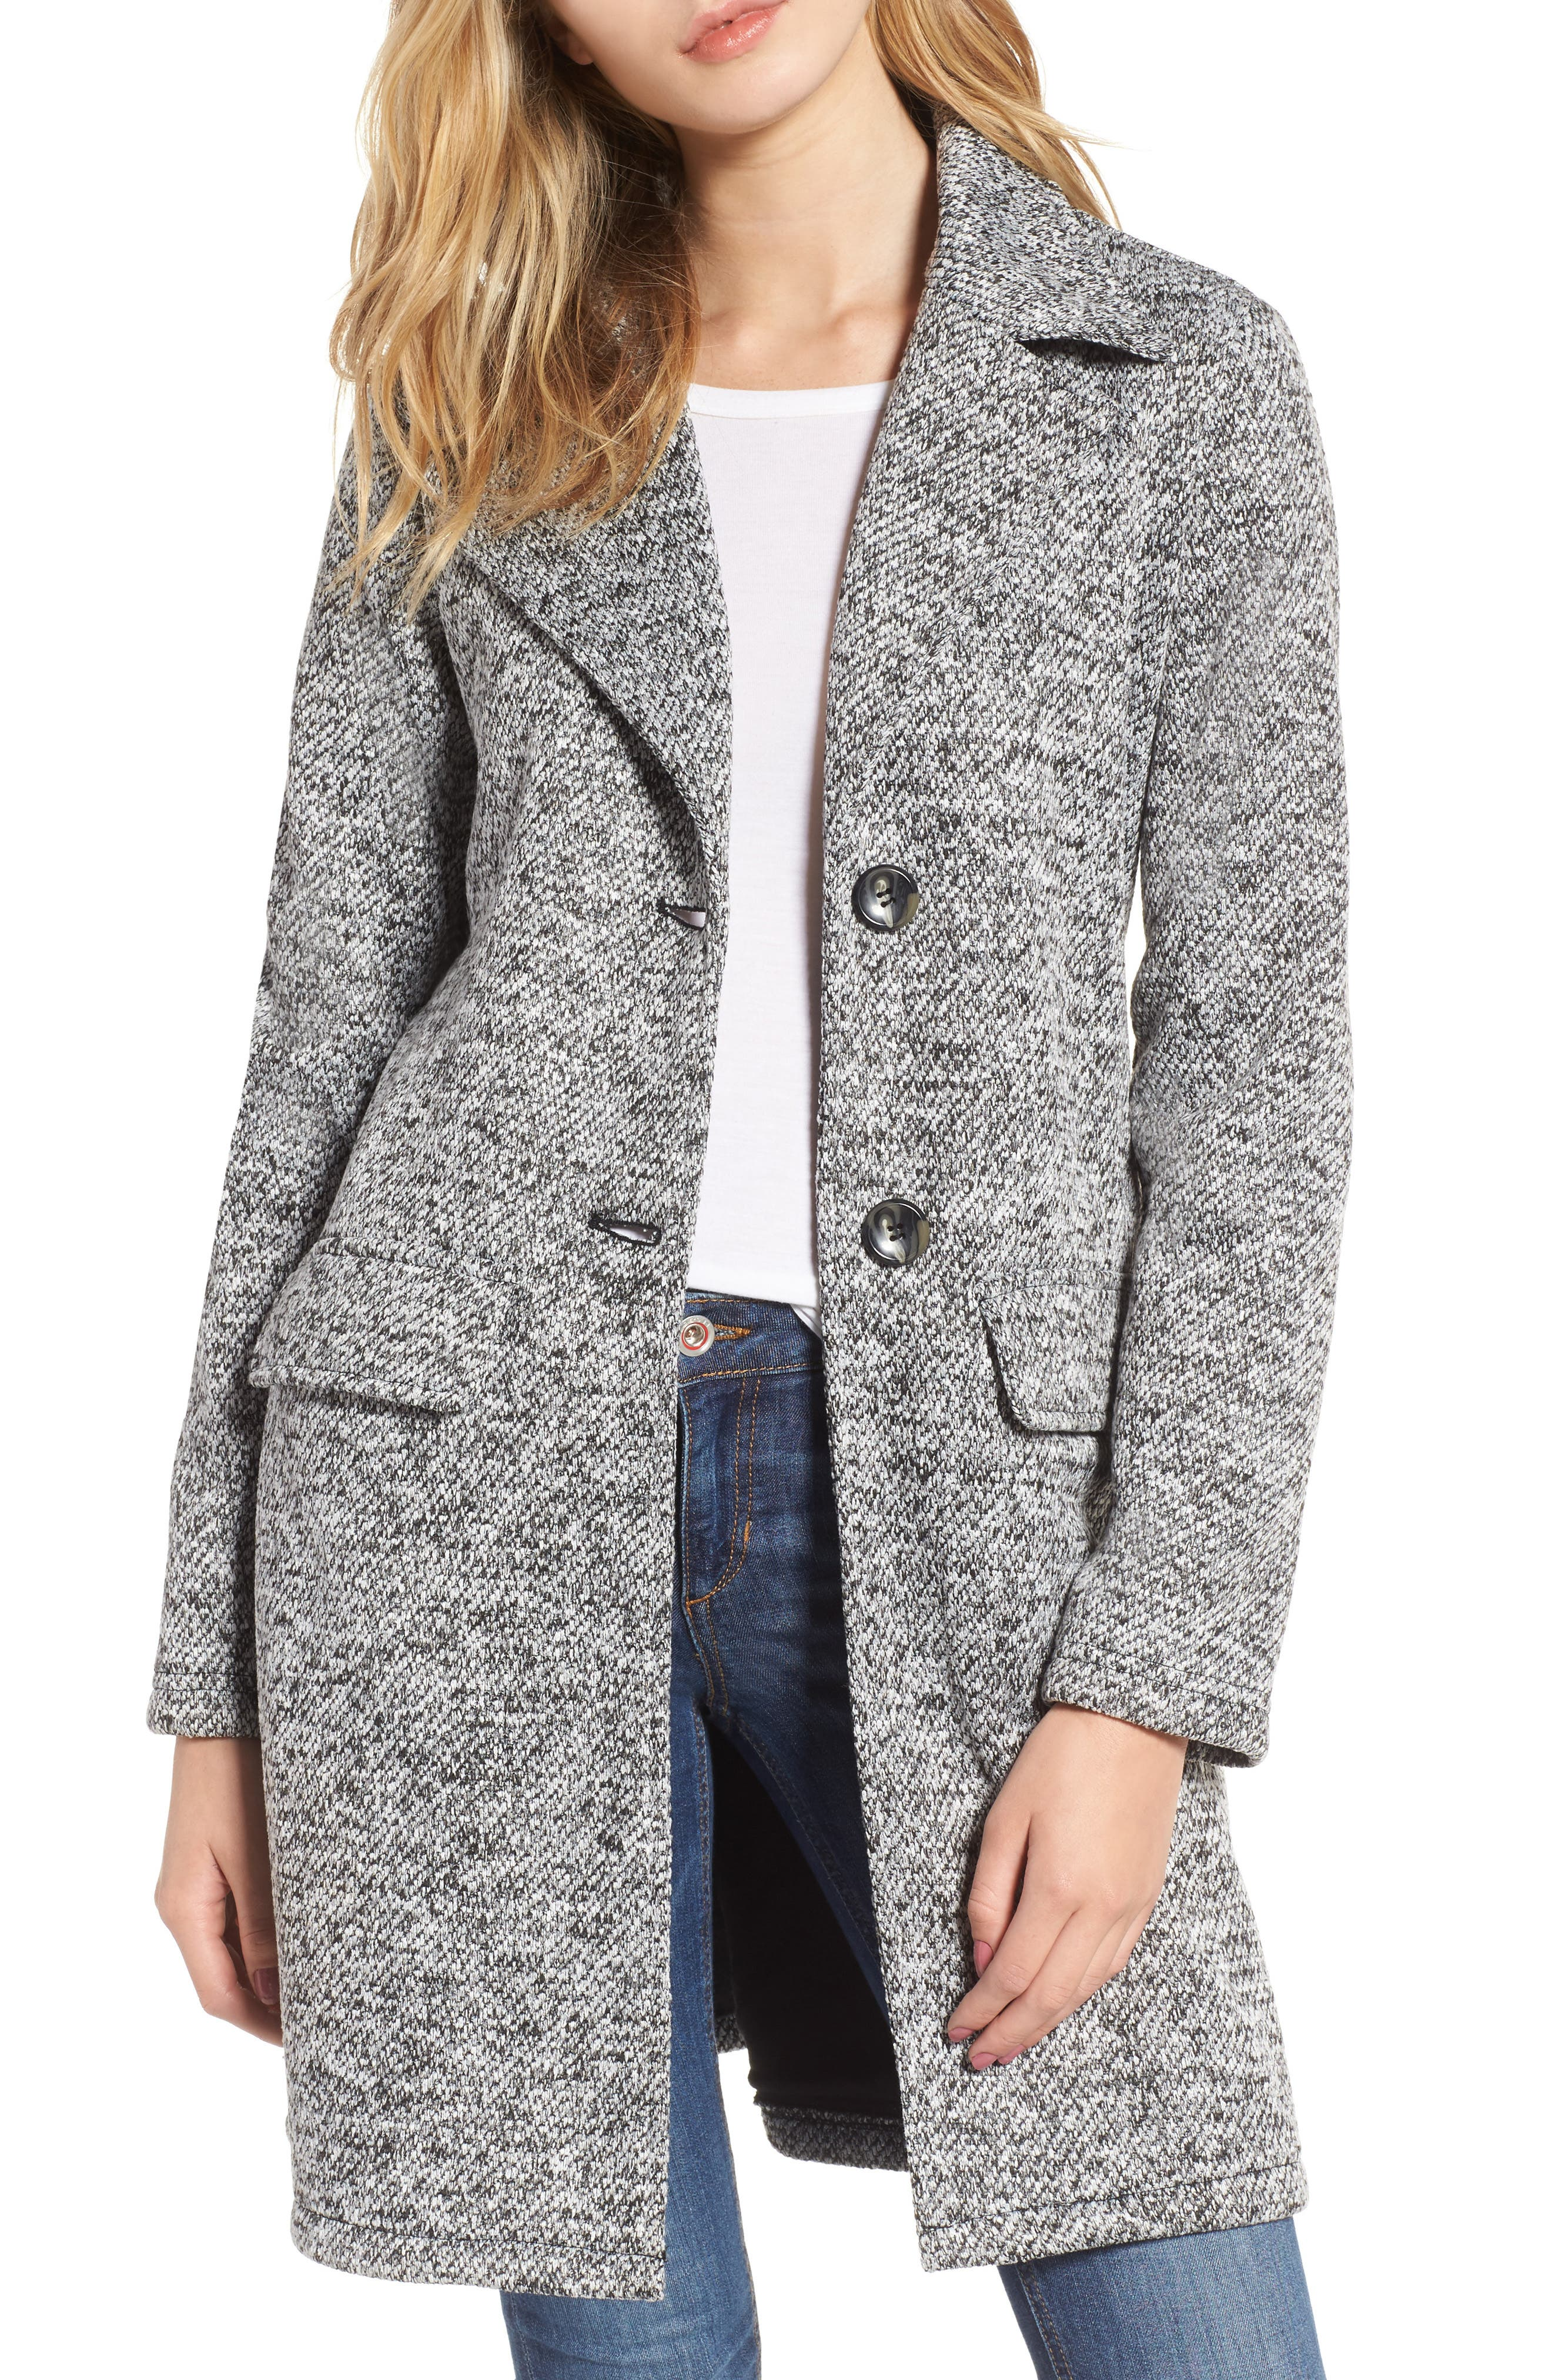 Belted Fleece Jacket,                         Main,                         color, Light Grey Heather